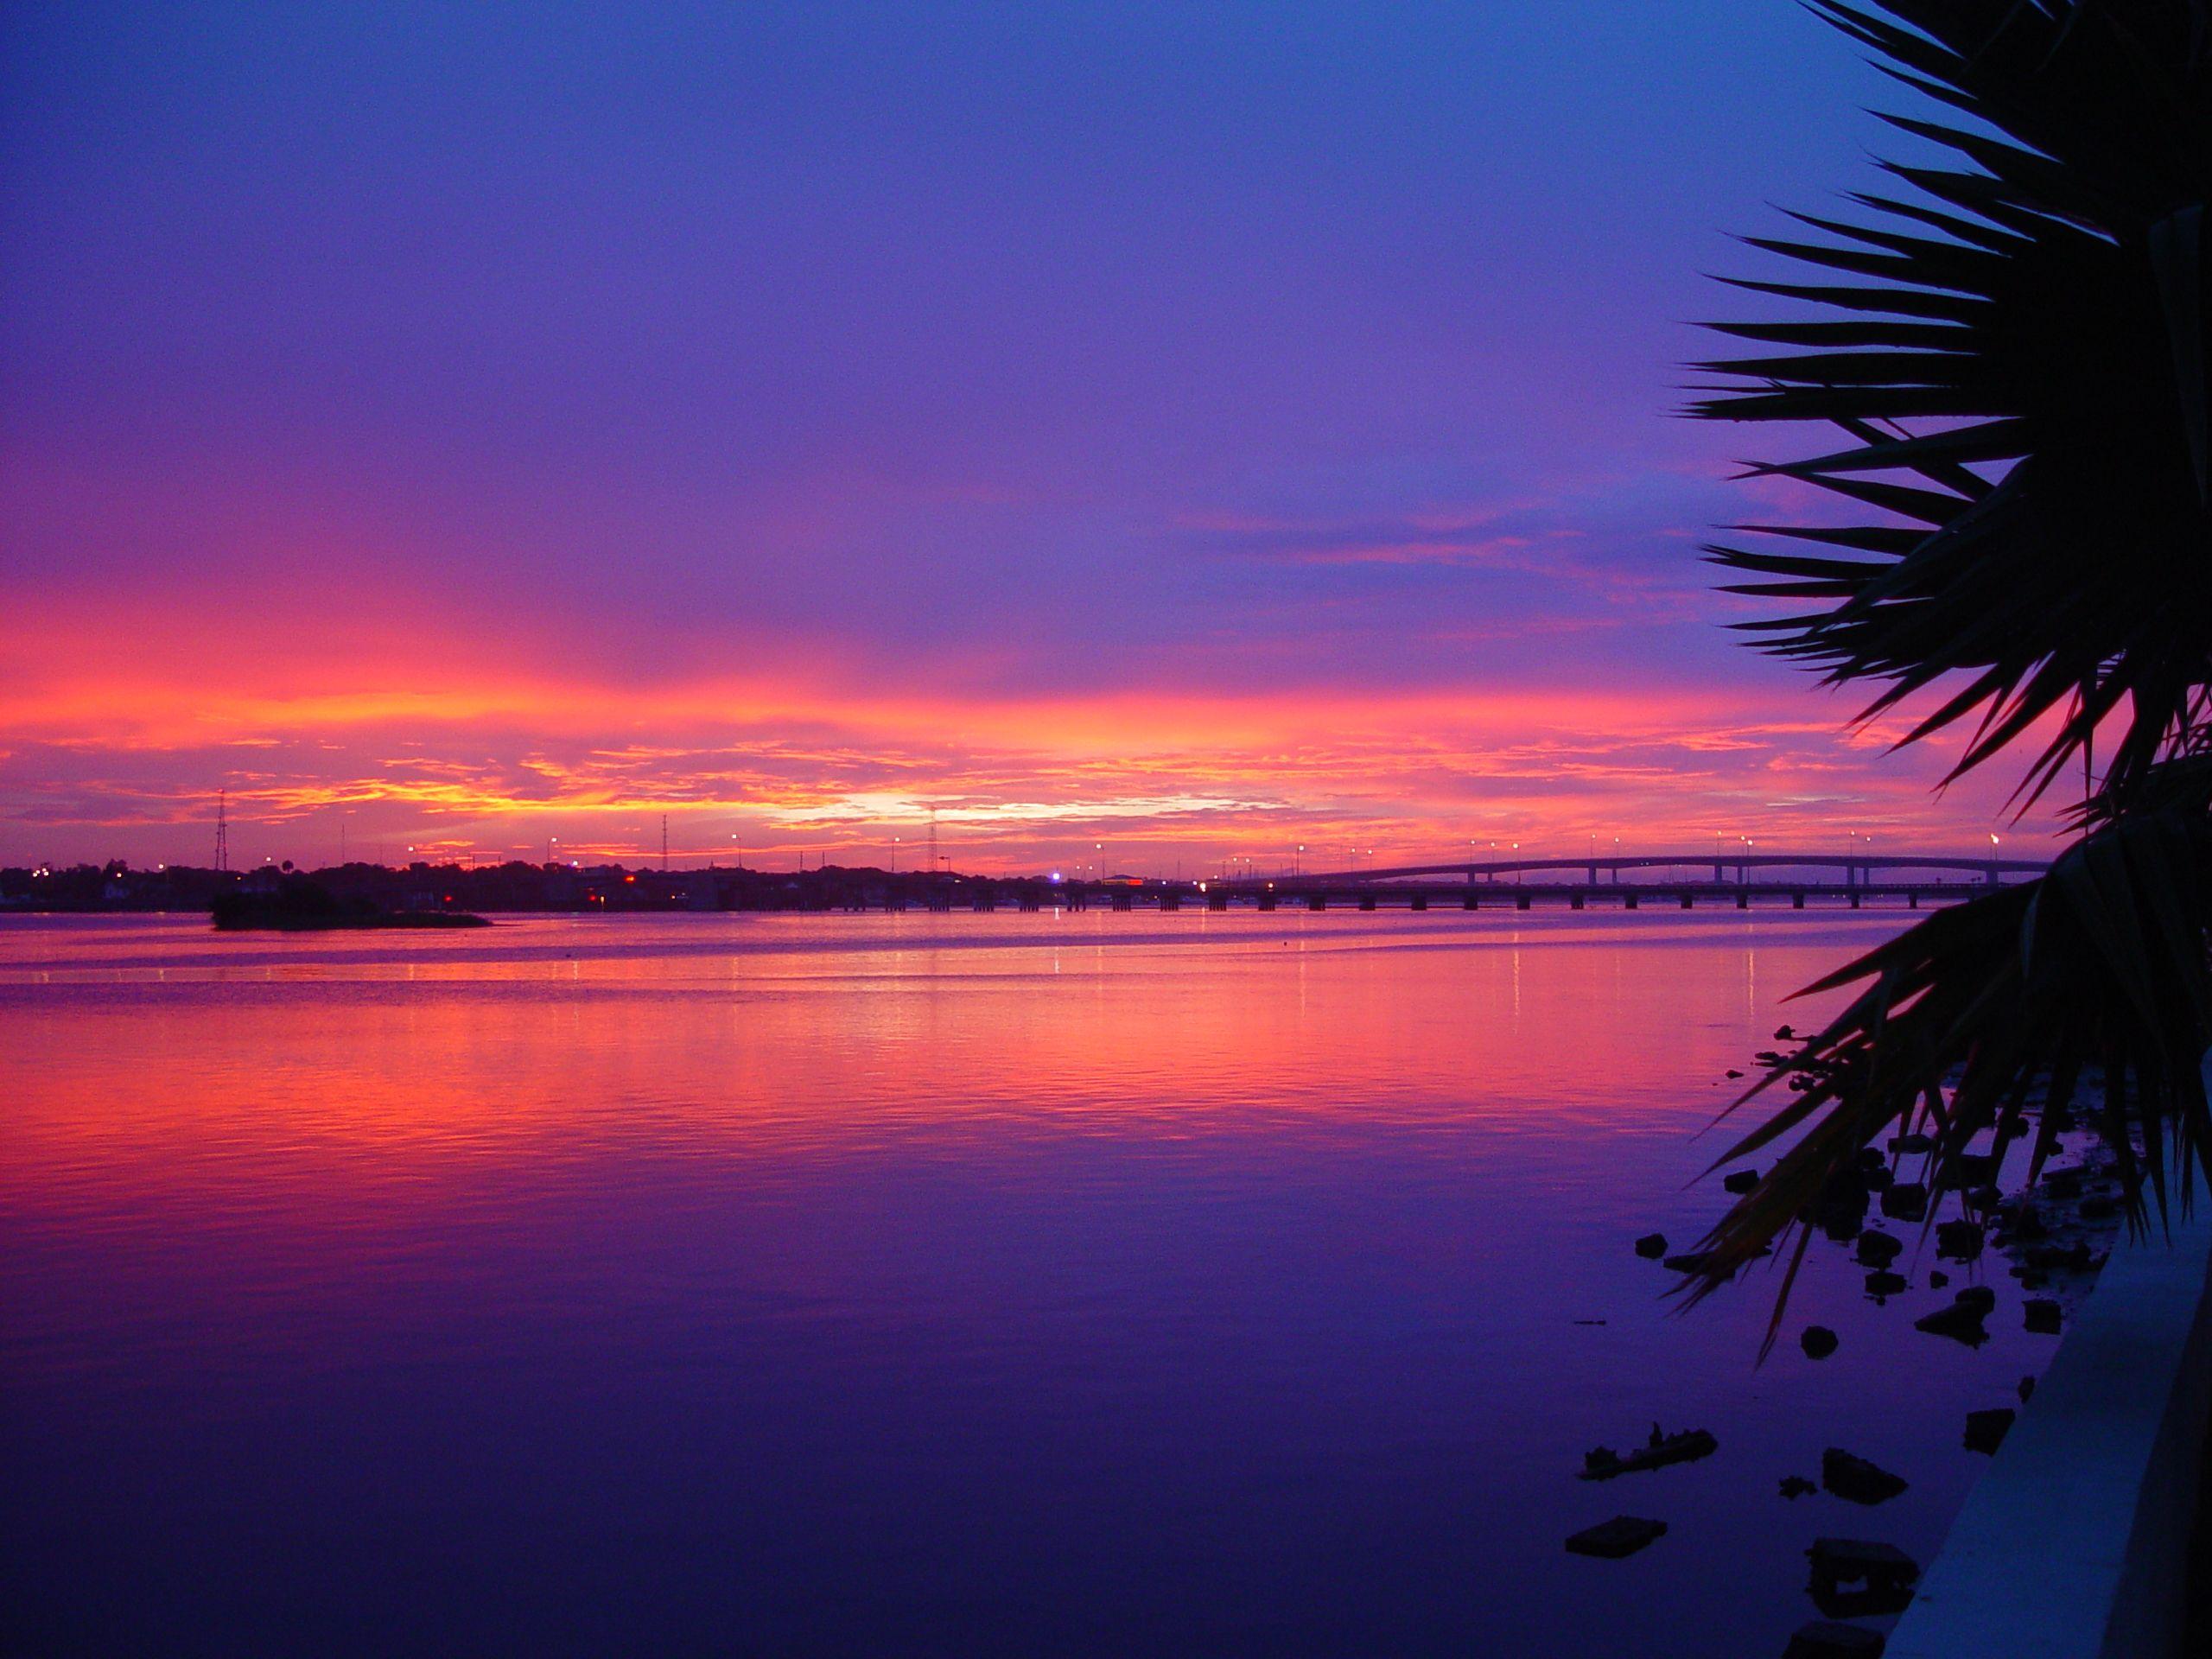 Sunset Over Beach Of Palm Trees Hd Wallpaper: Daytona Beach Halifax River Tropical Palm Tree Sunset